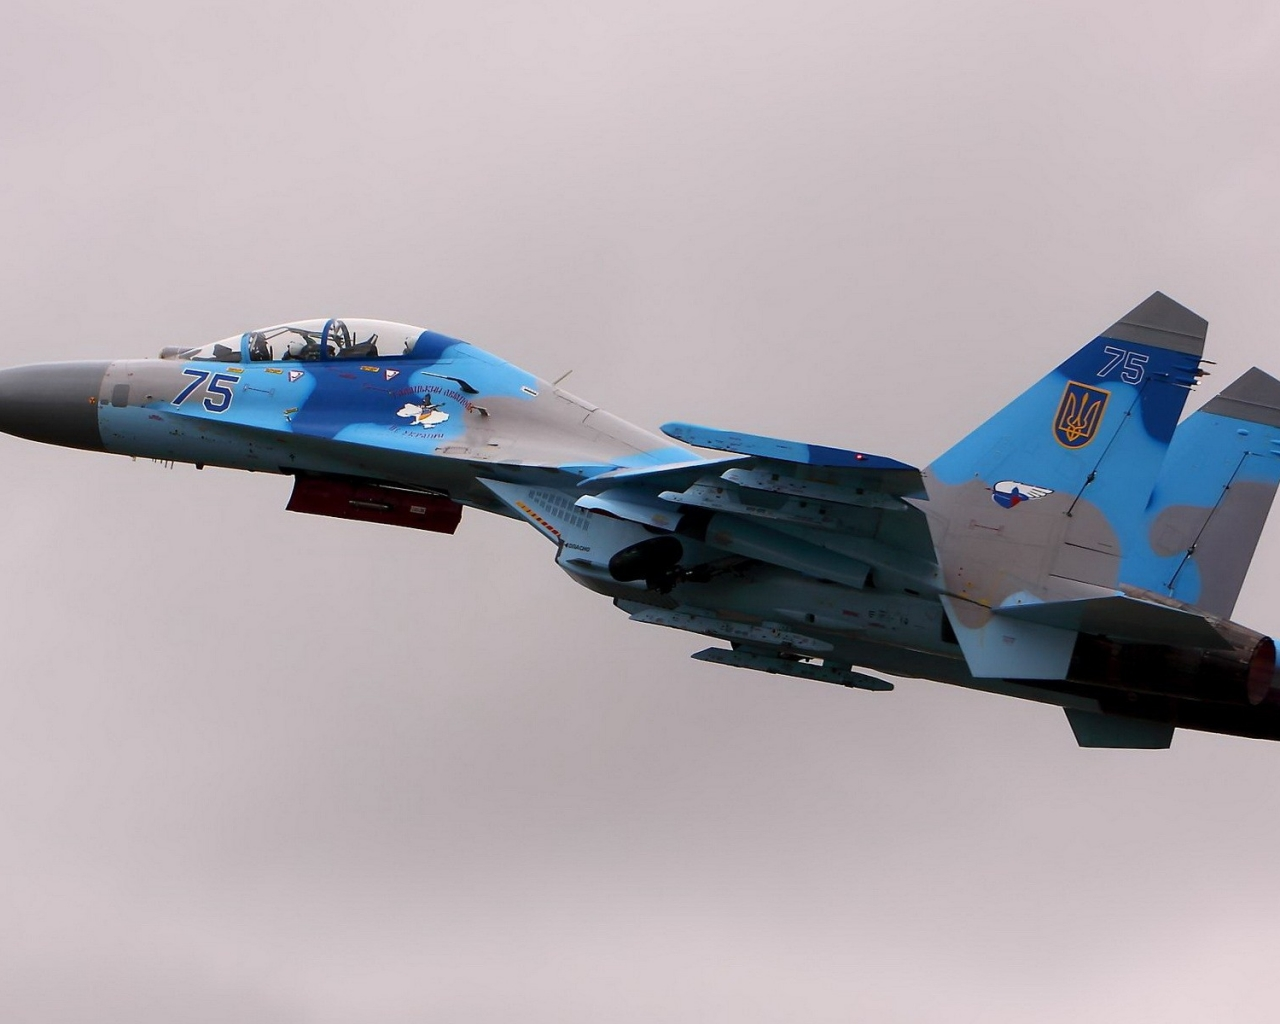 Avión militar - 1280x1024